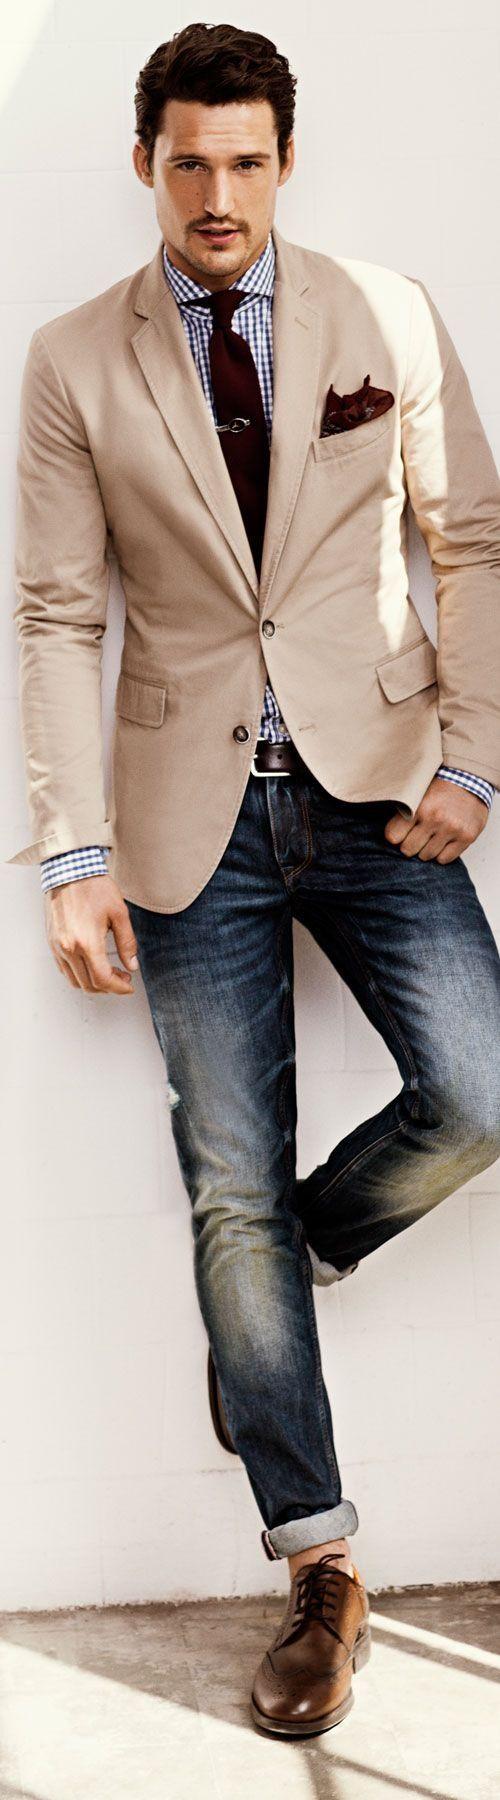 The cream blazer with blue jeans and brown tie/shoes | Menu0026#39;s fashion | Pinterest | Cream blazer ...